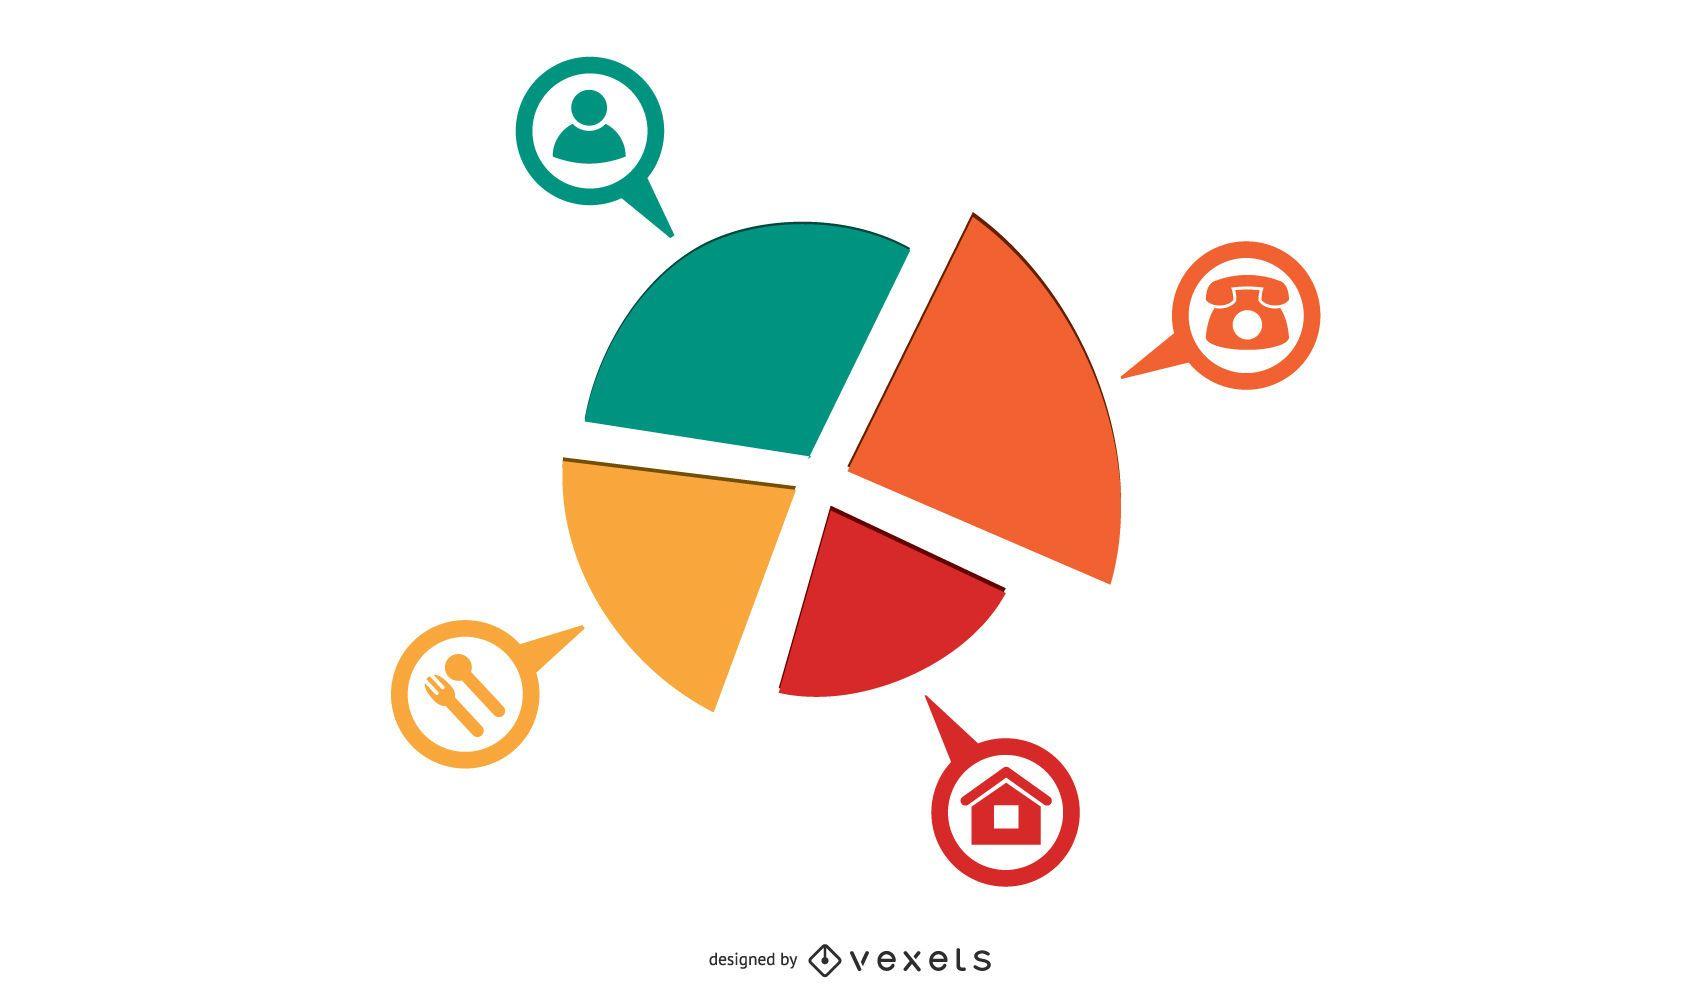 Colorful Triangular Wheel Circular Infographic